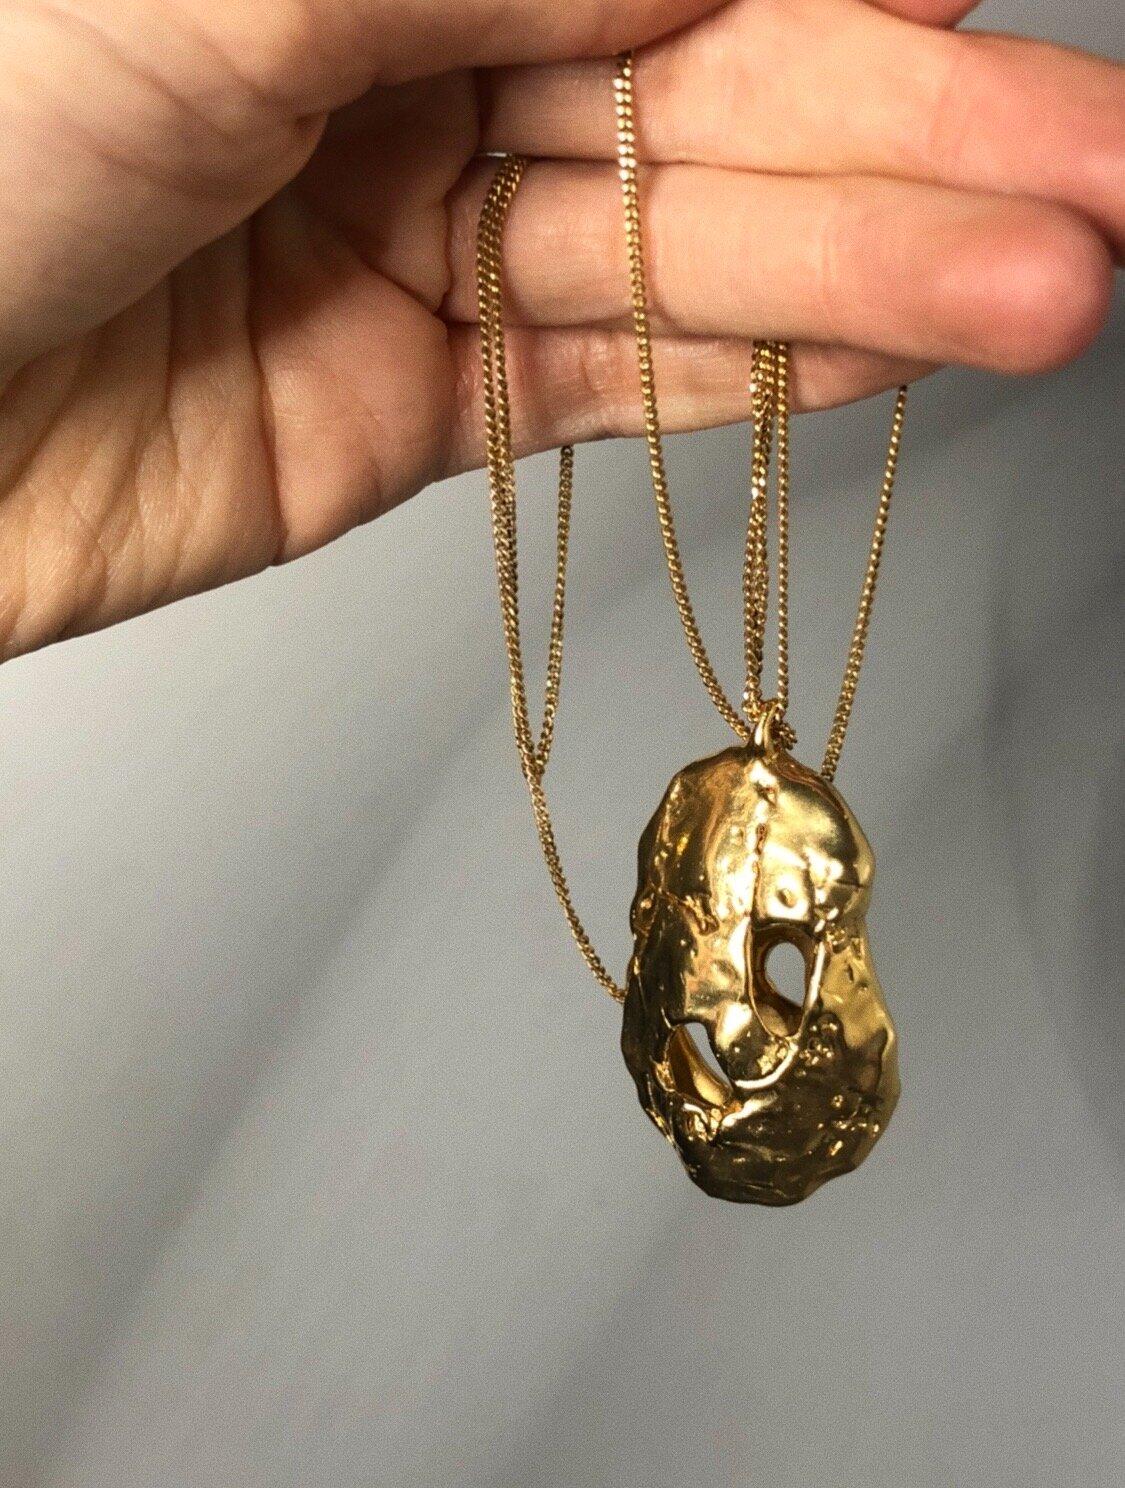 Broken Necklace Chain : broken, necklace, chain, Broken, Necklace, Växa, Jewellery, Handmade, Silver